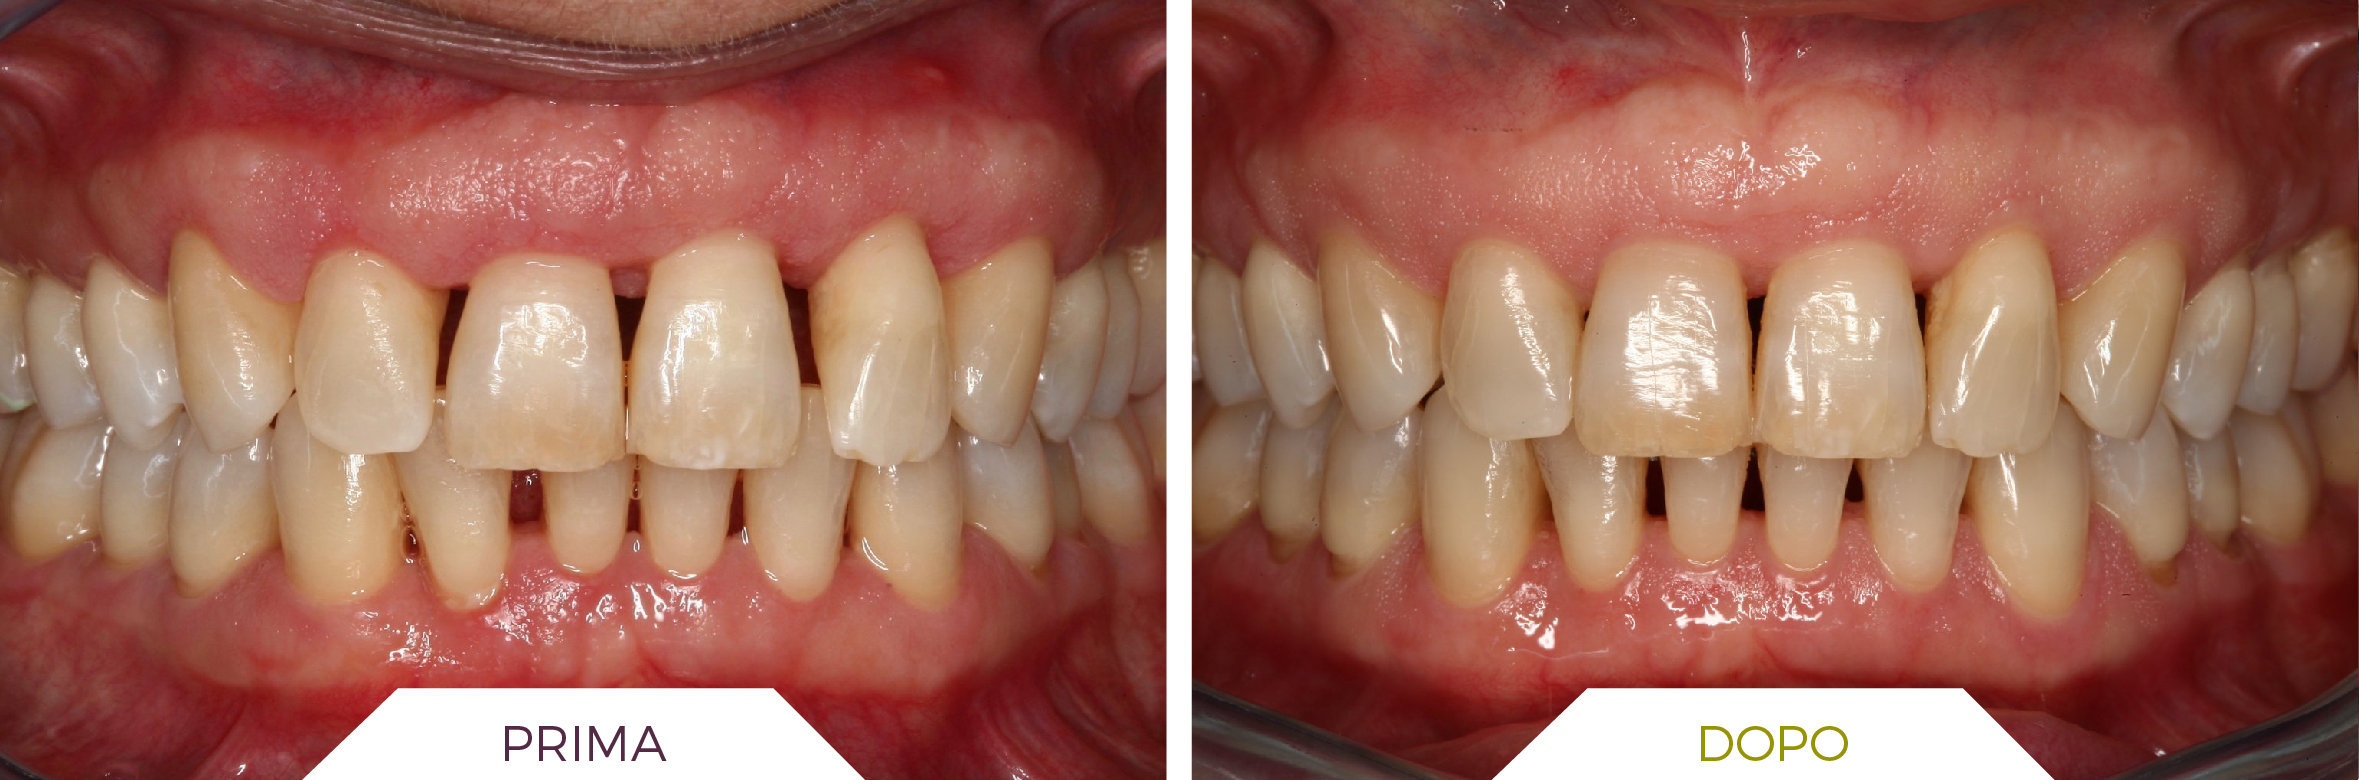 Inlaser- Ortodonzia-02